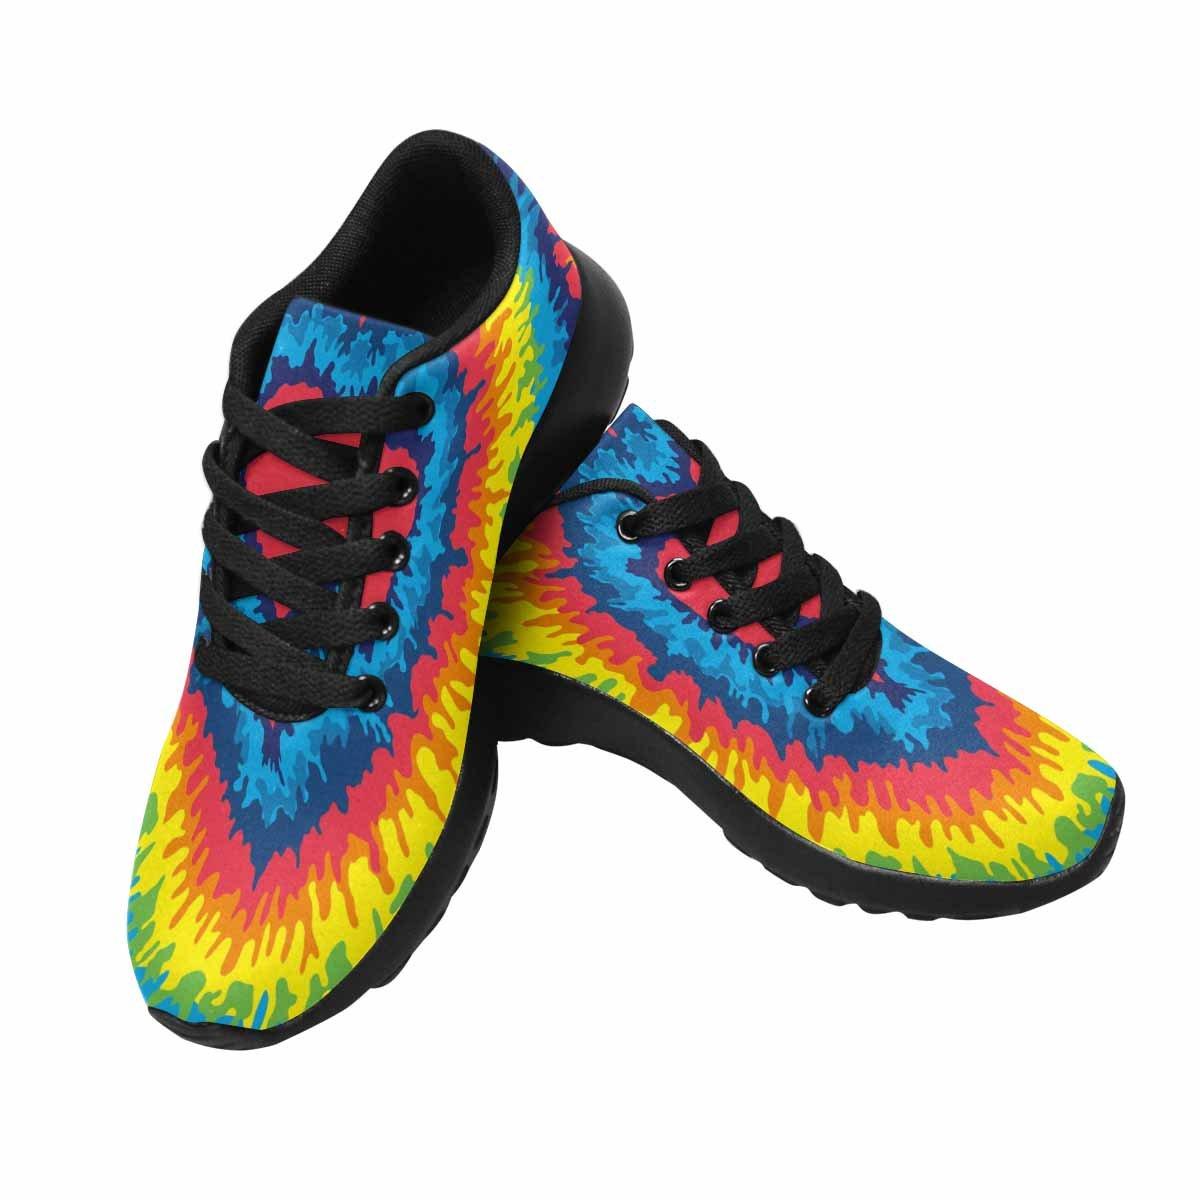 InterestPrint Women's Go Easy Walking Comfort Sports Athletic Shoes Heart, Love, Rainbow Tie Dye Background US 7